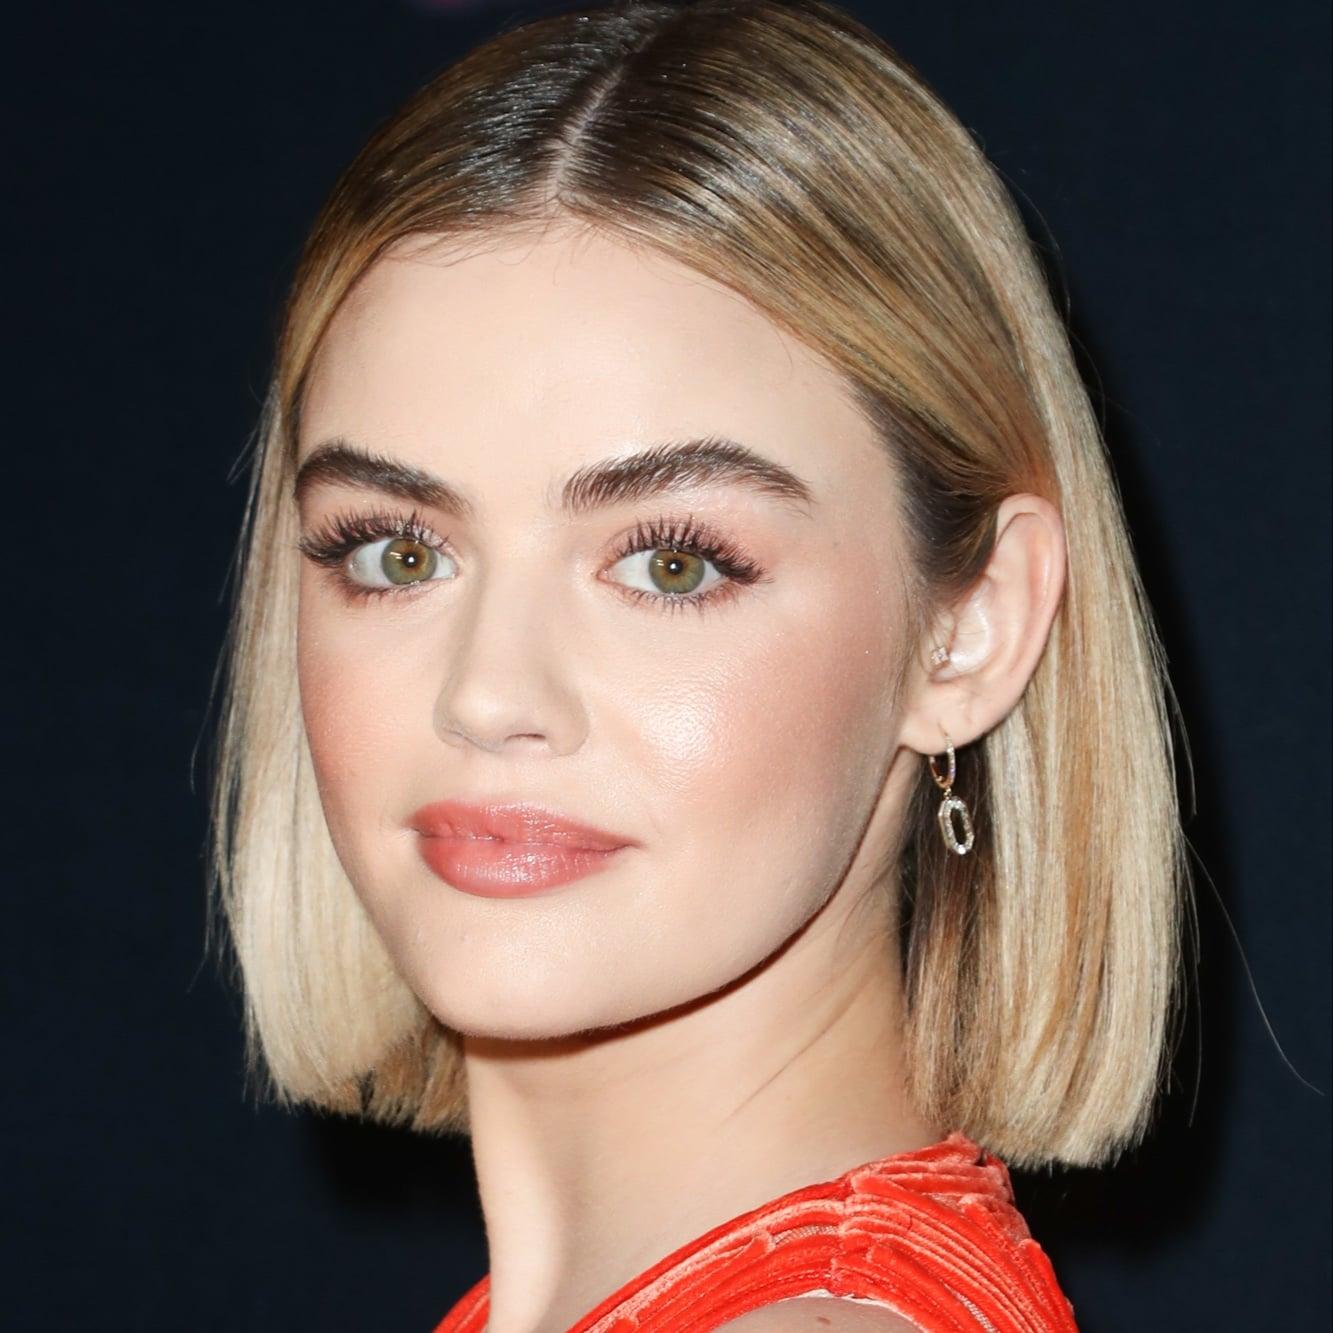 Lucy Hale Brown Hair 2019 Popsugar Beauty Australia